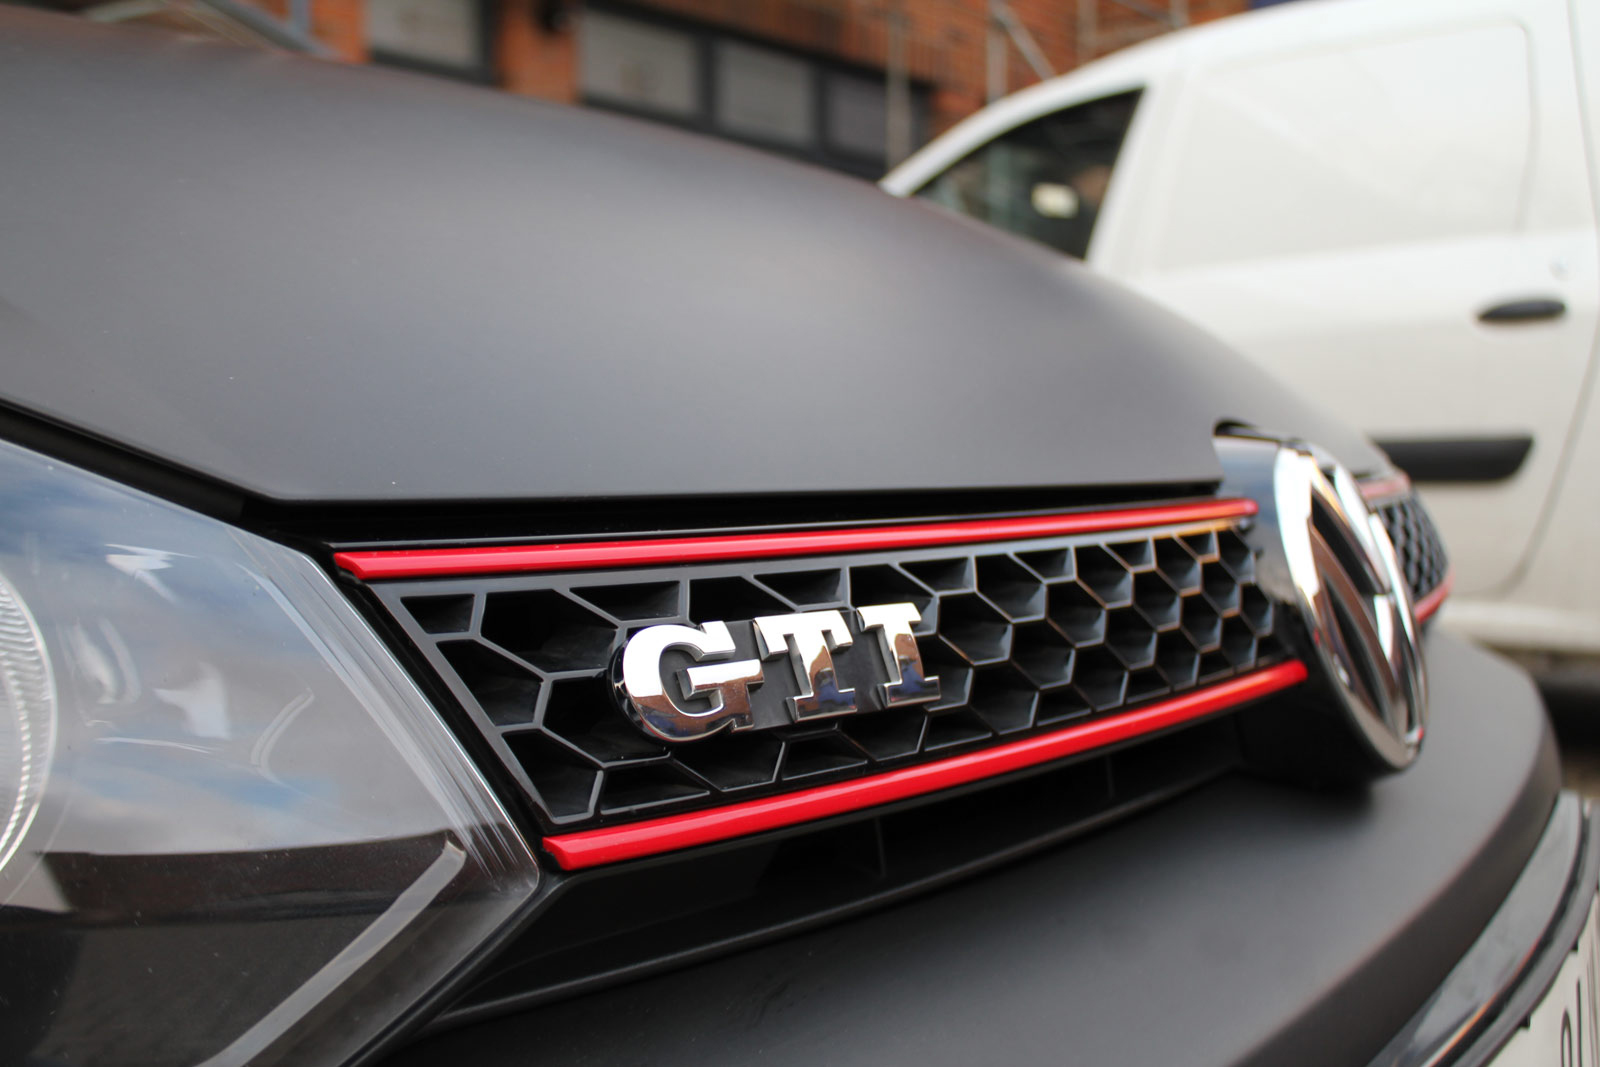 VW_GOLF_GTI_SCHWARZ_MATT_SCHEIBENTOENUNG_21